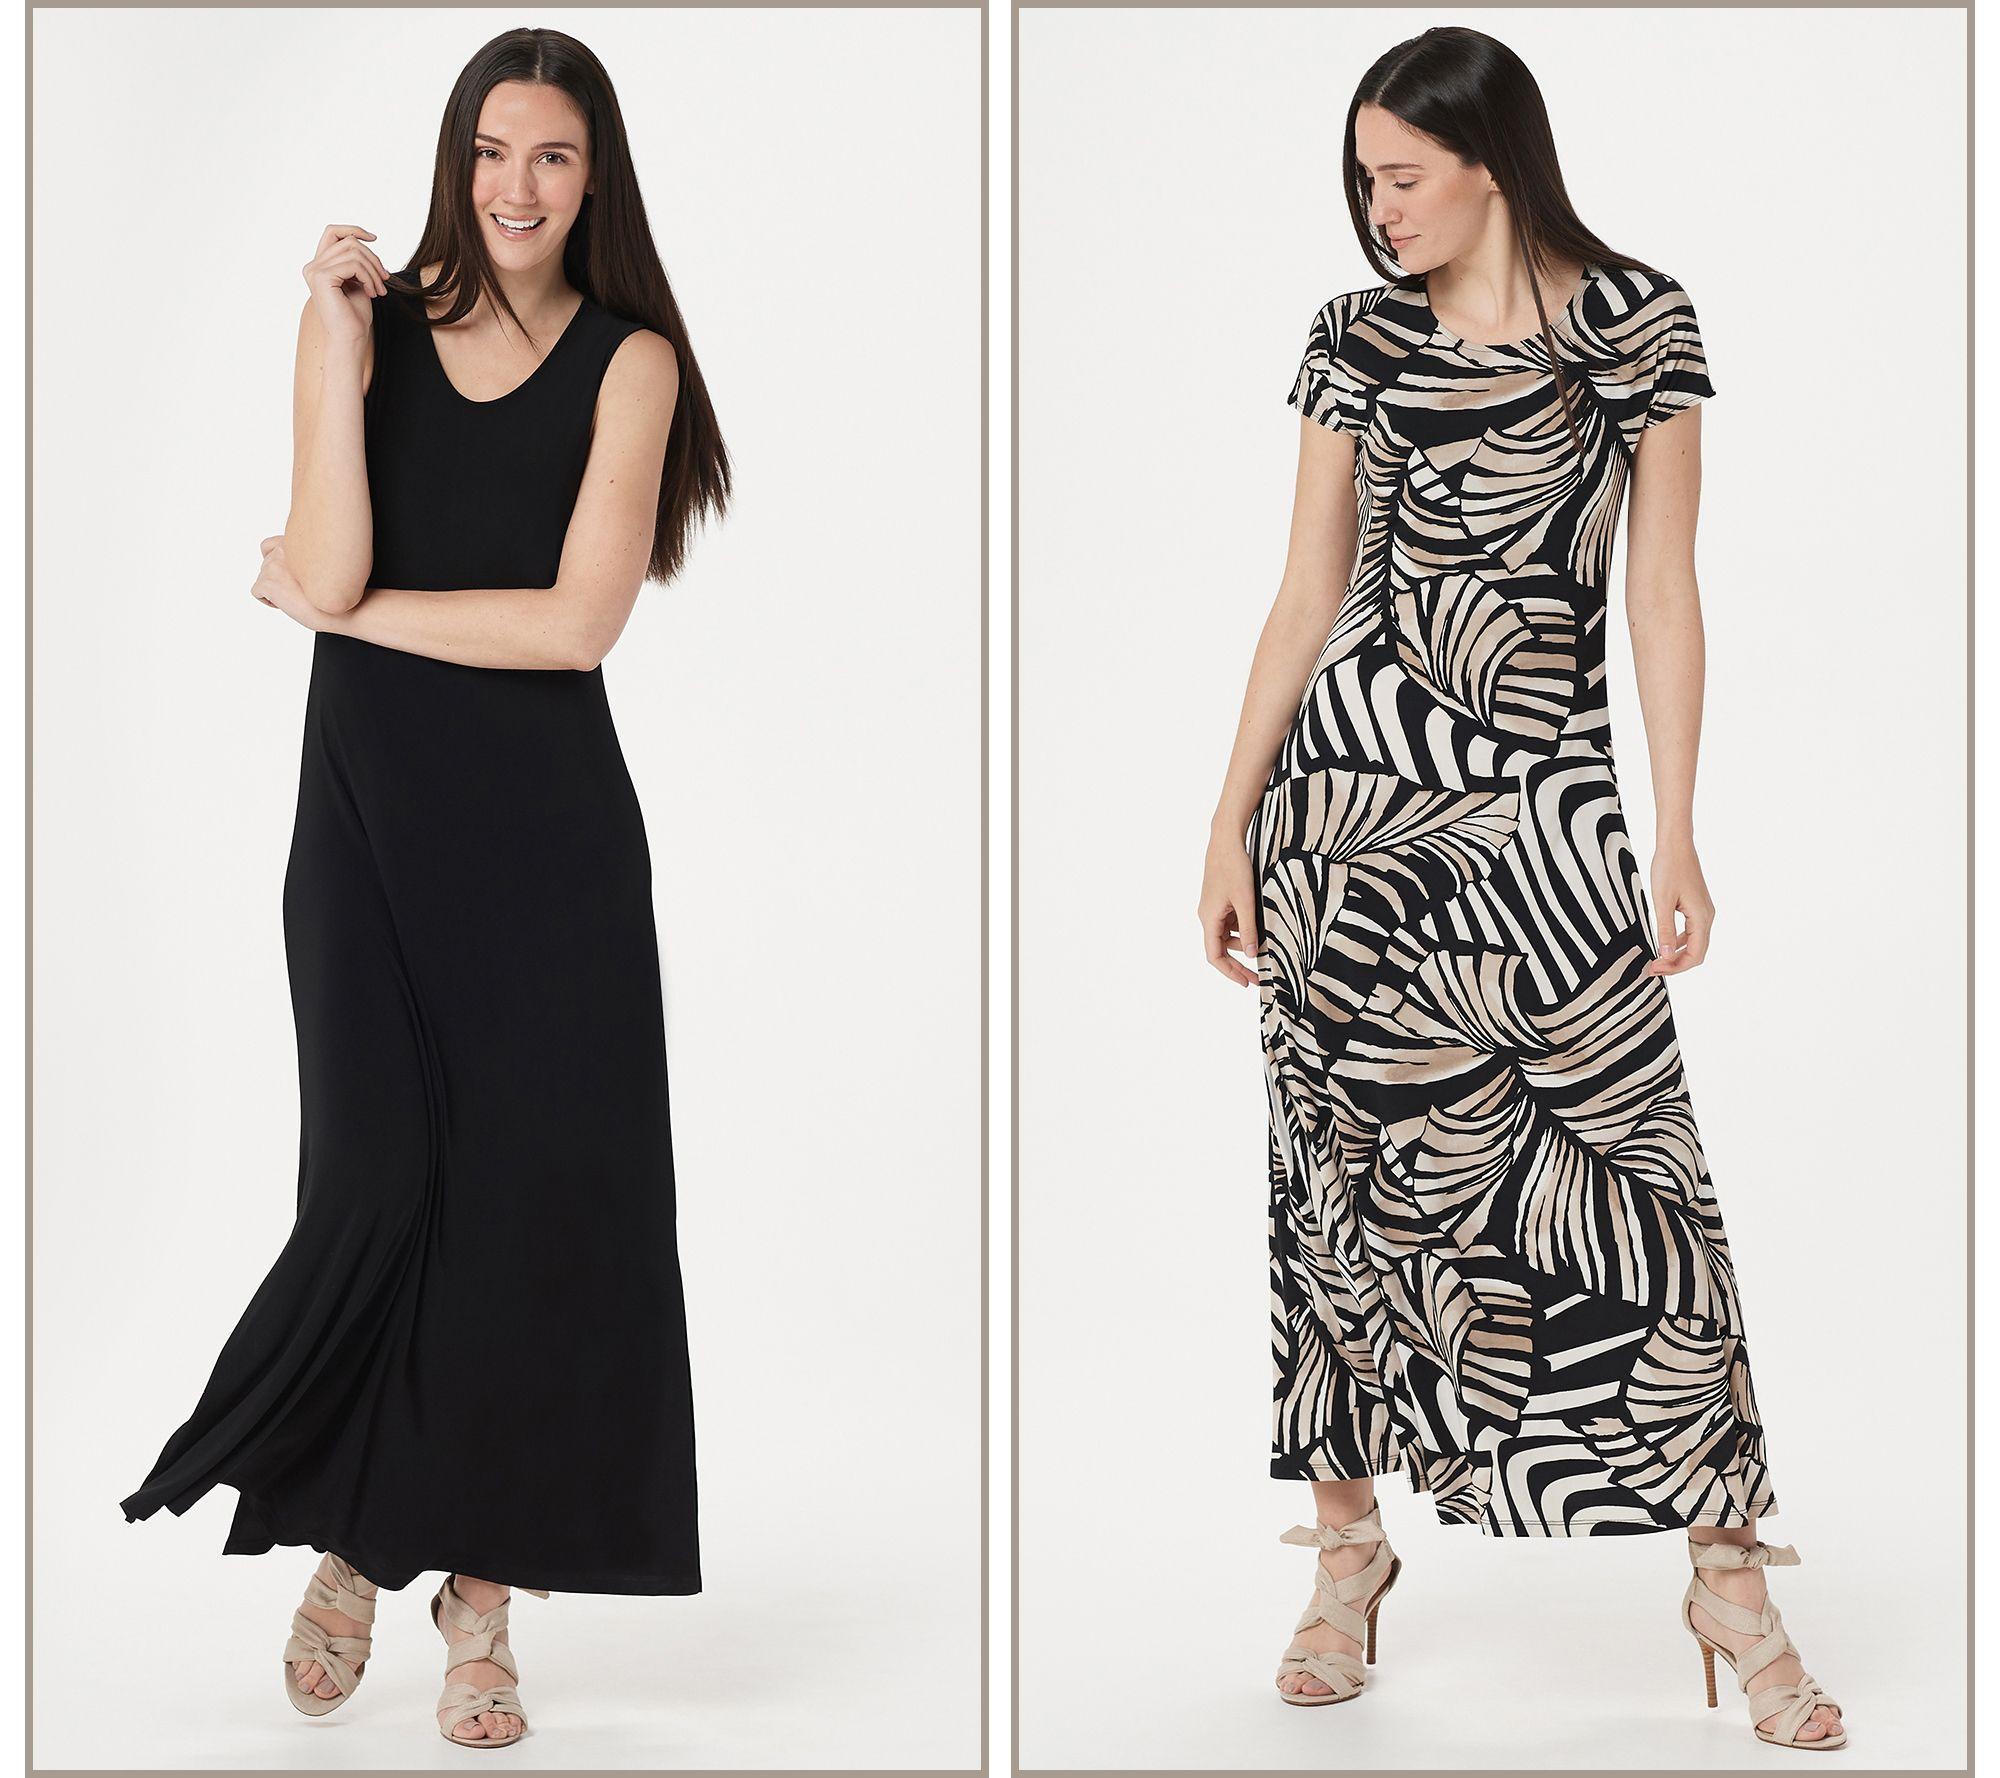 Attitudes By Renee Regular Como Jersey Set Of 2 Maxi Dresses Qvc Com Maxi Dress Summertime Dresses Women With Control [ 1778 x 2000 Pixel ]